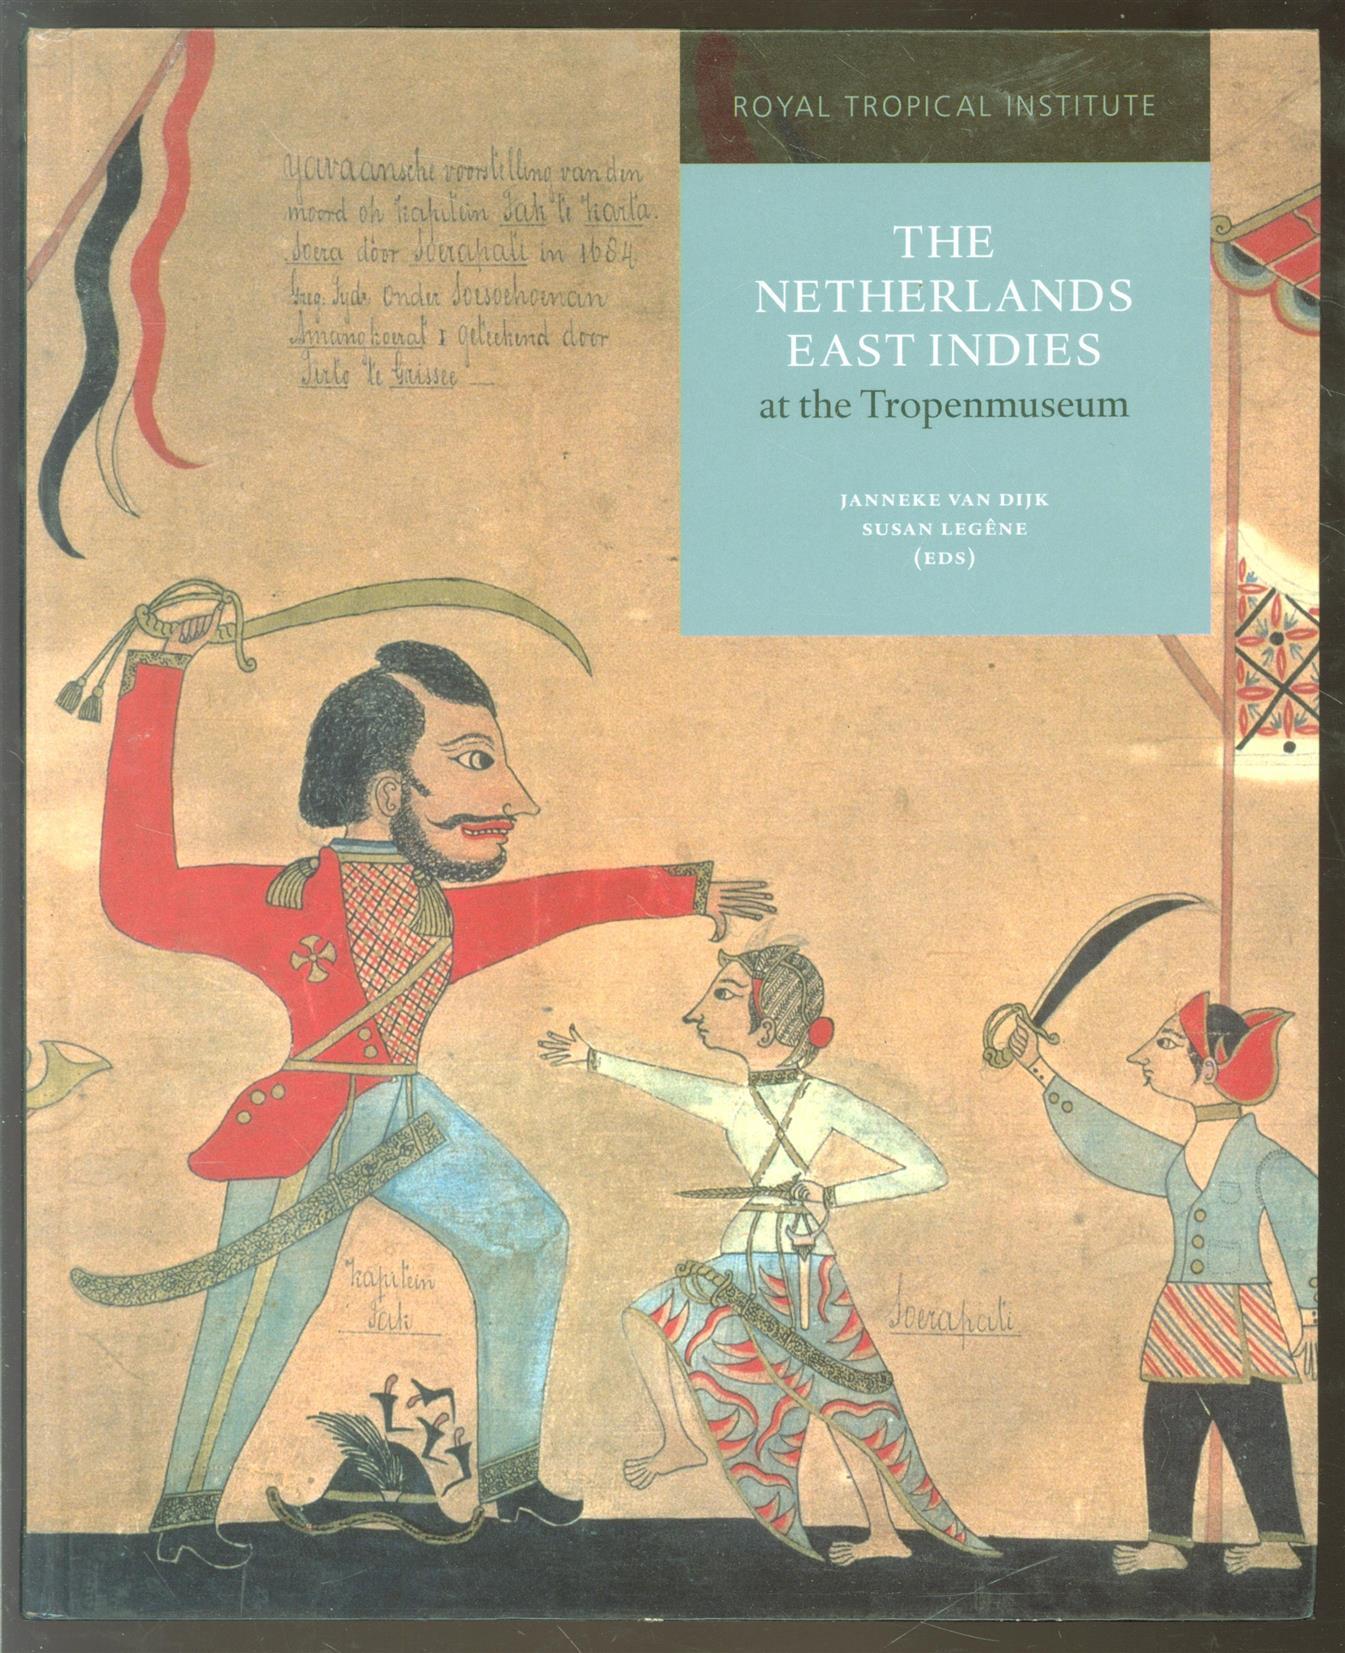 SUSAN LEGEÌ'NE, JANNEKE VAN. DIJK - The Netherlands East Indies at the Tropenmuseum: a colonial history